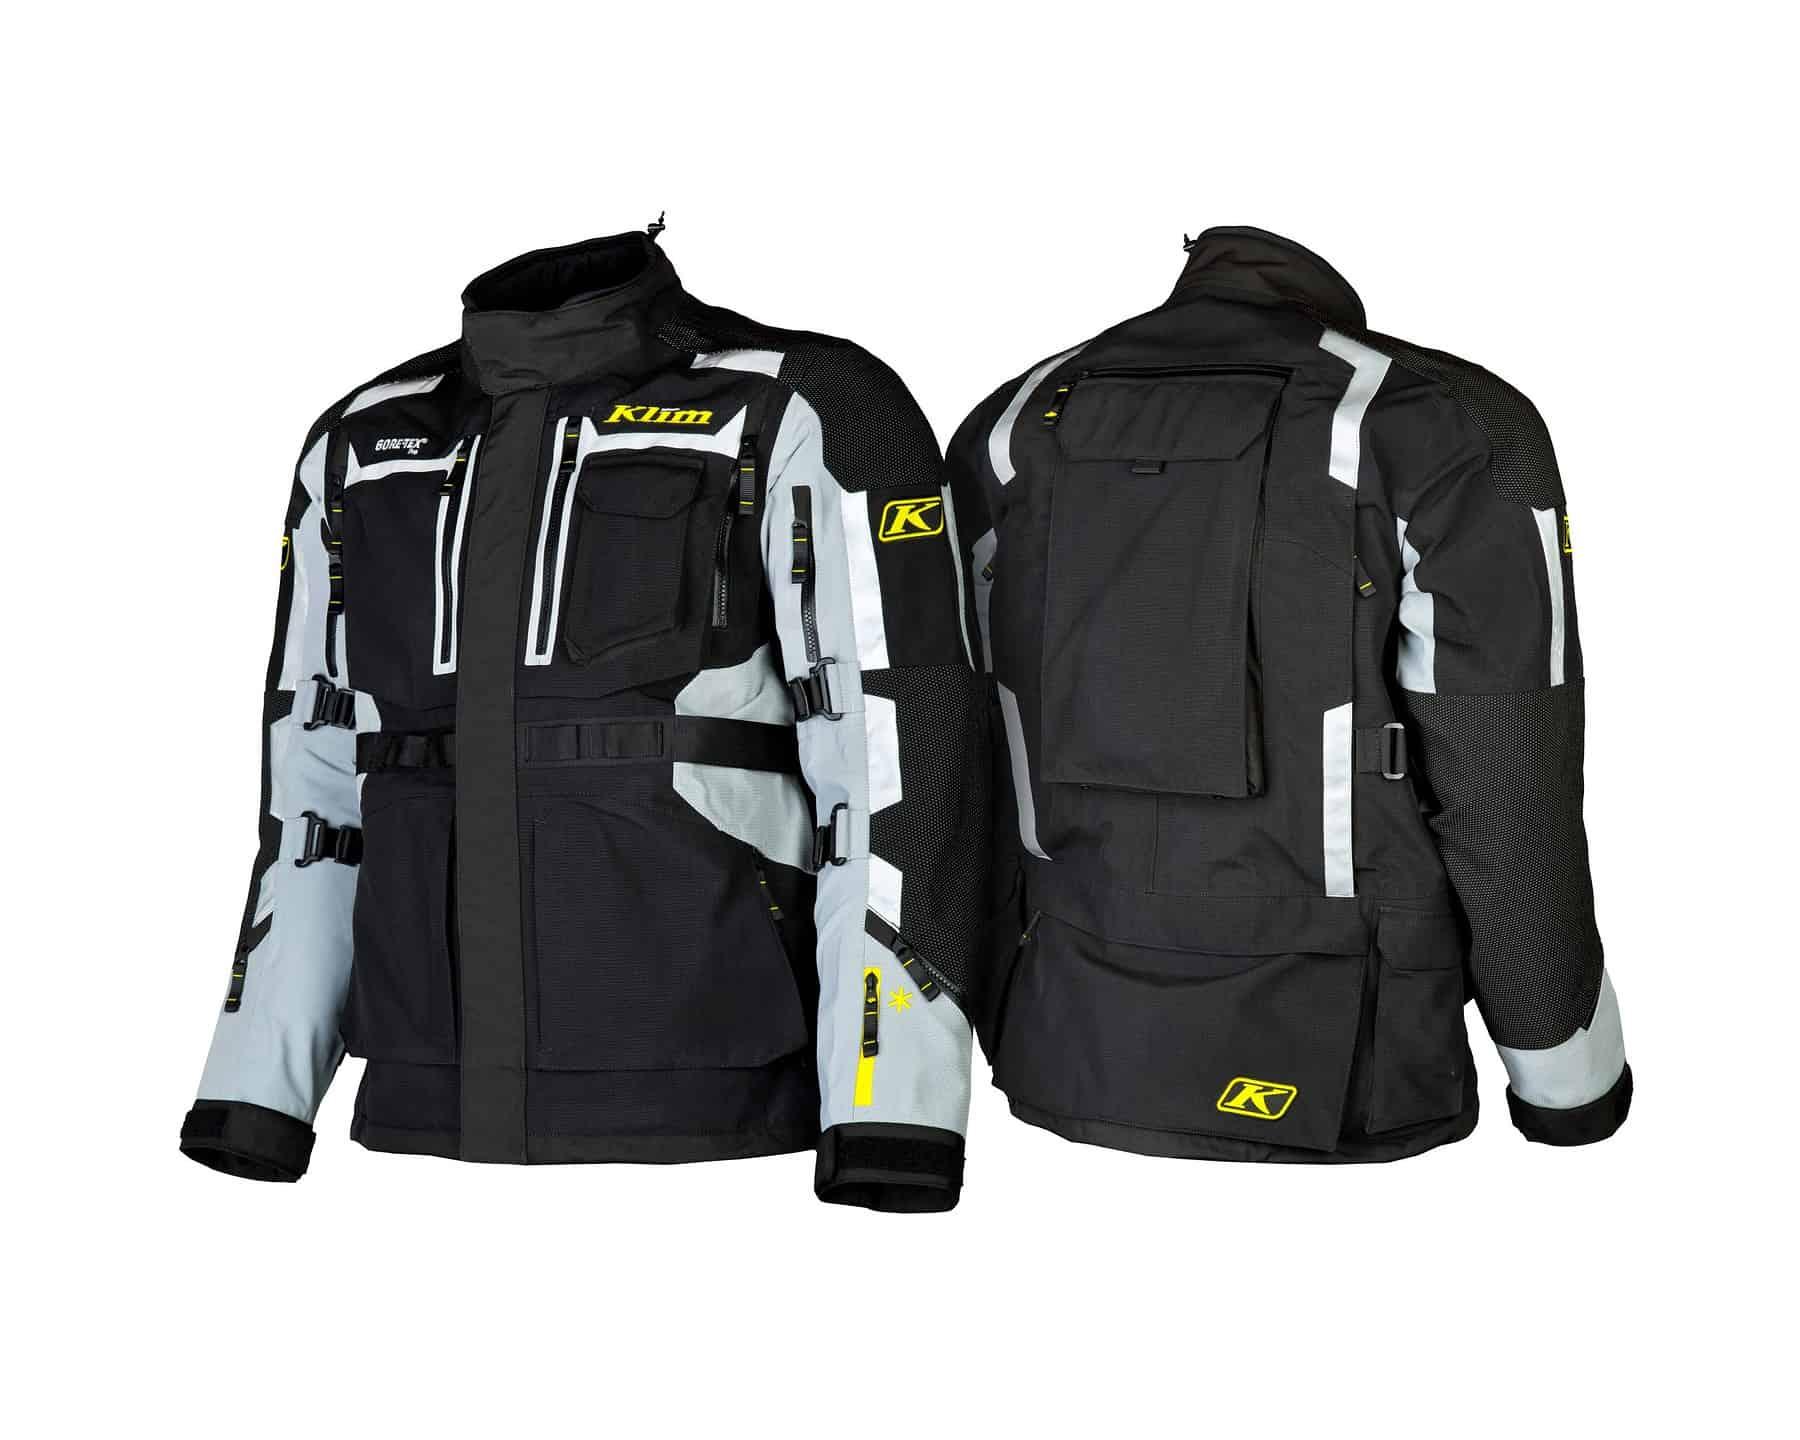 S Adventure Rally Jacket 3291-004-600